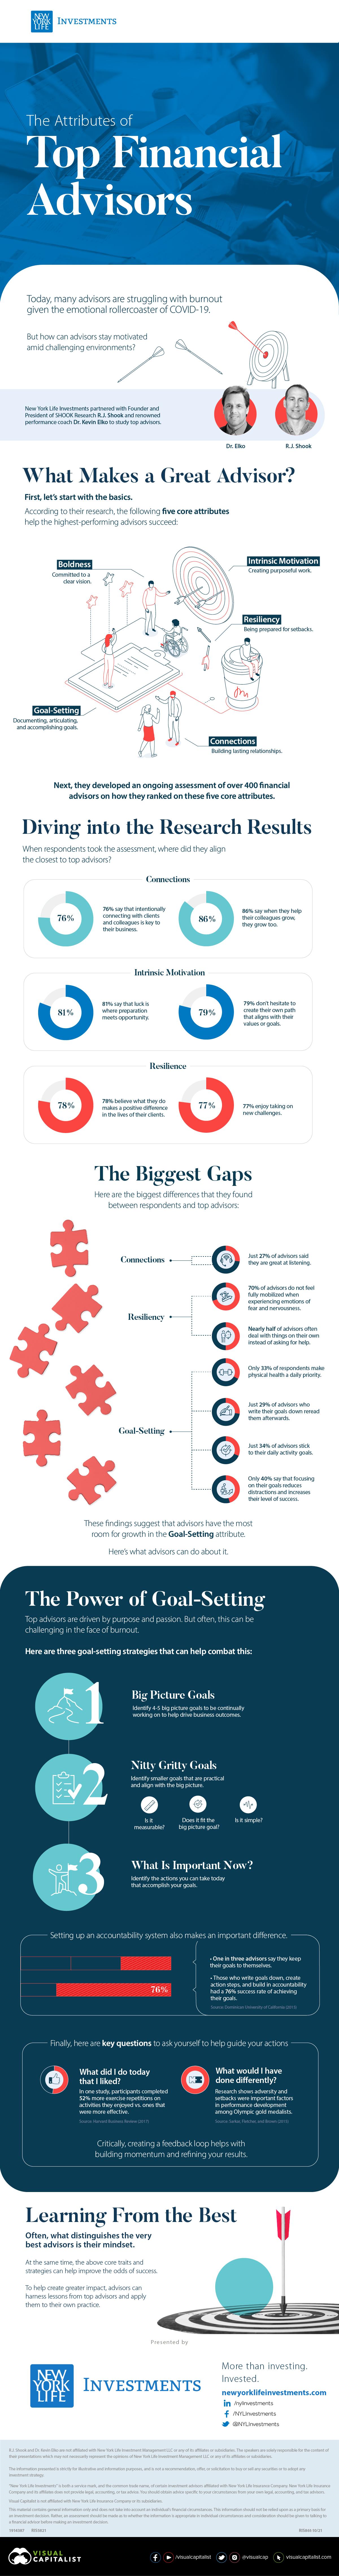 best financial advisors infographic